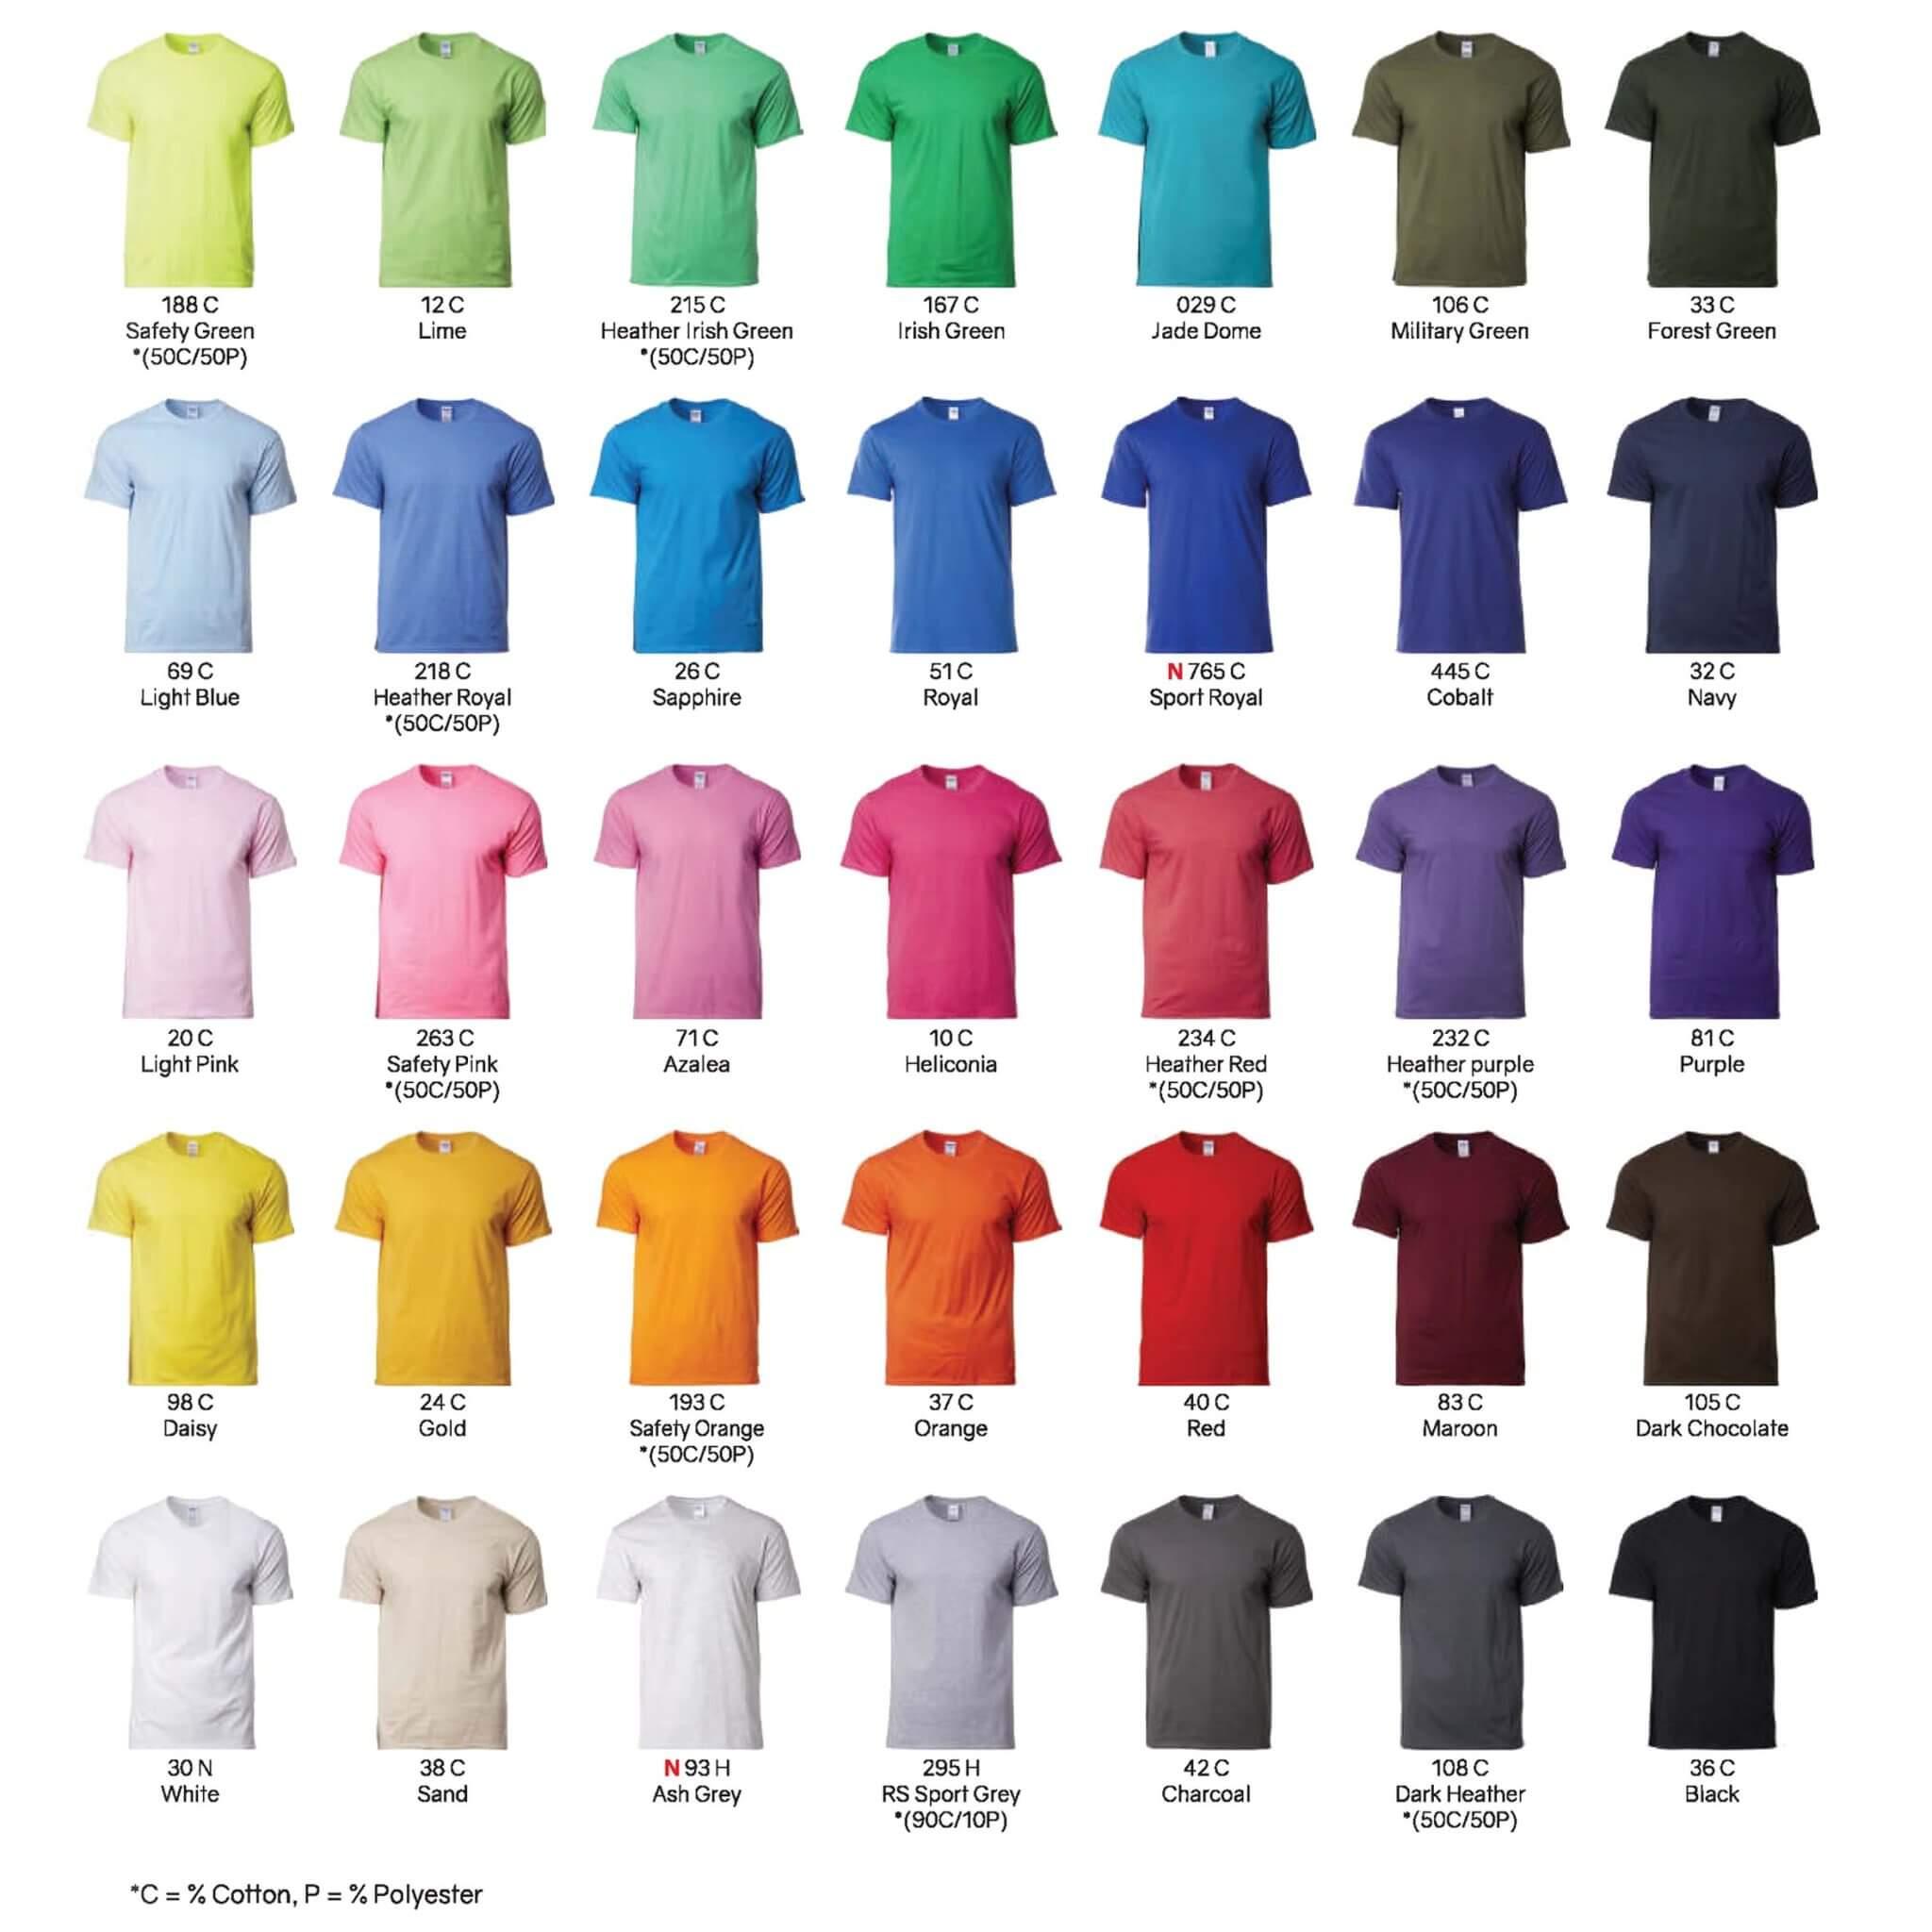 Gildan 76000 cotton roundneck t-shirt